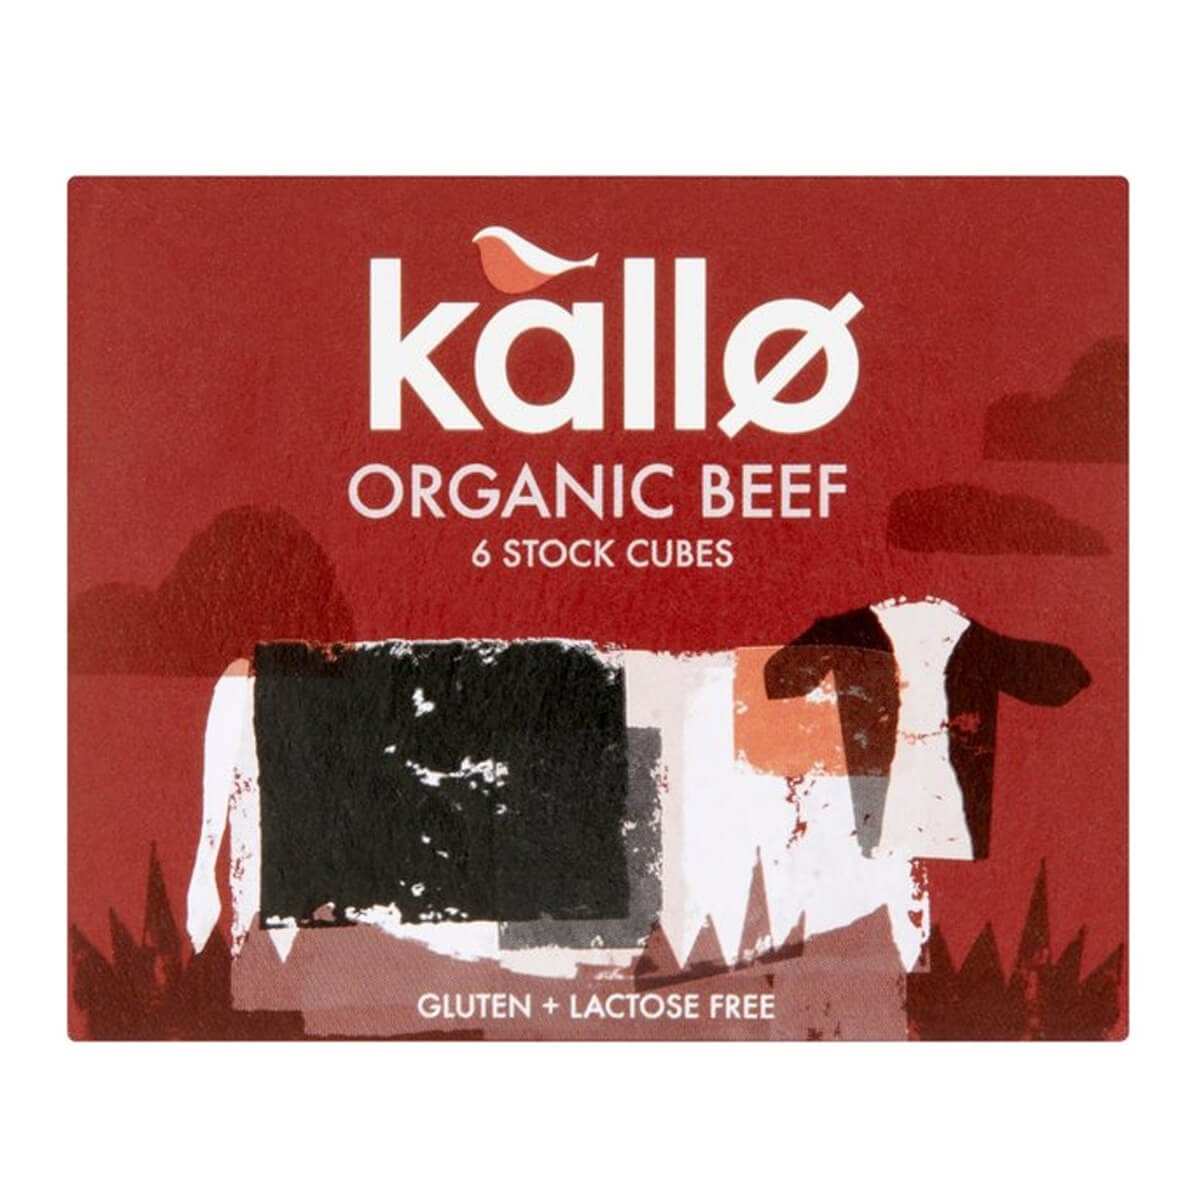 Kallo Organic Beef Stock Cubes